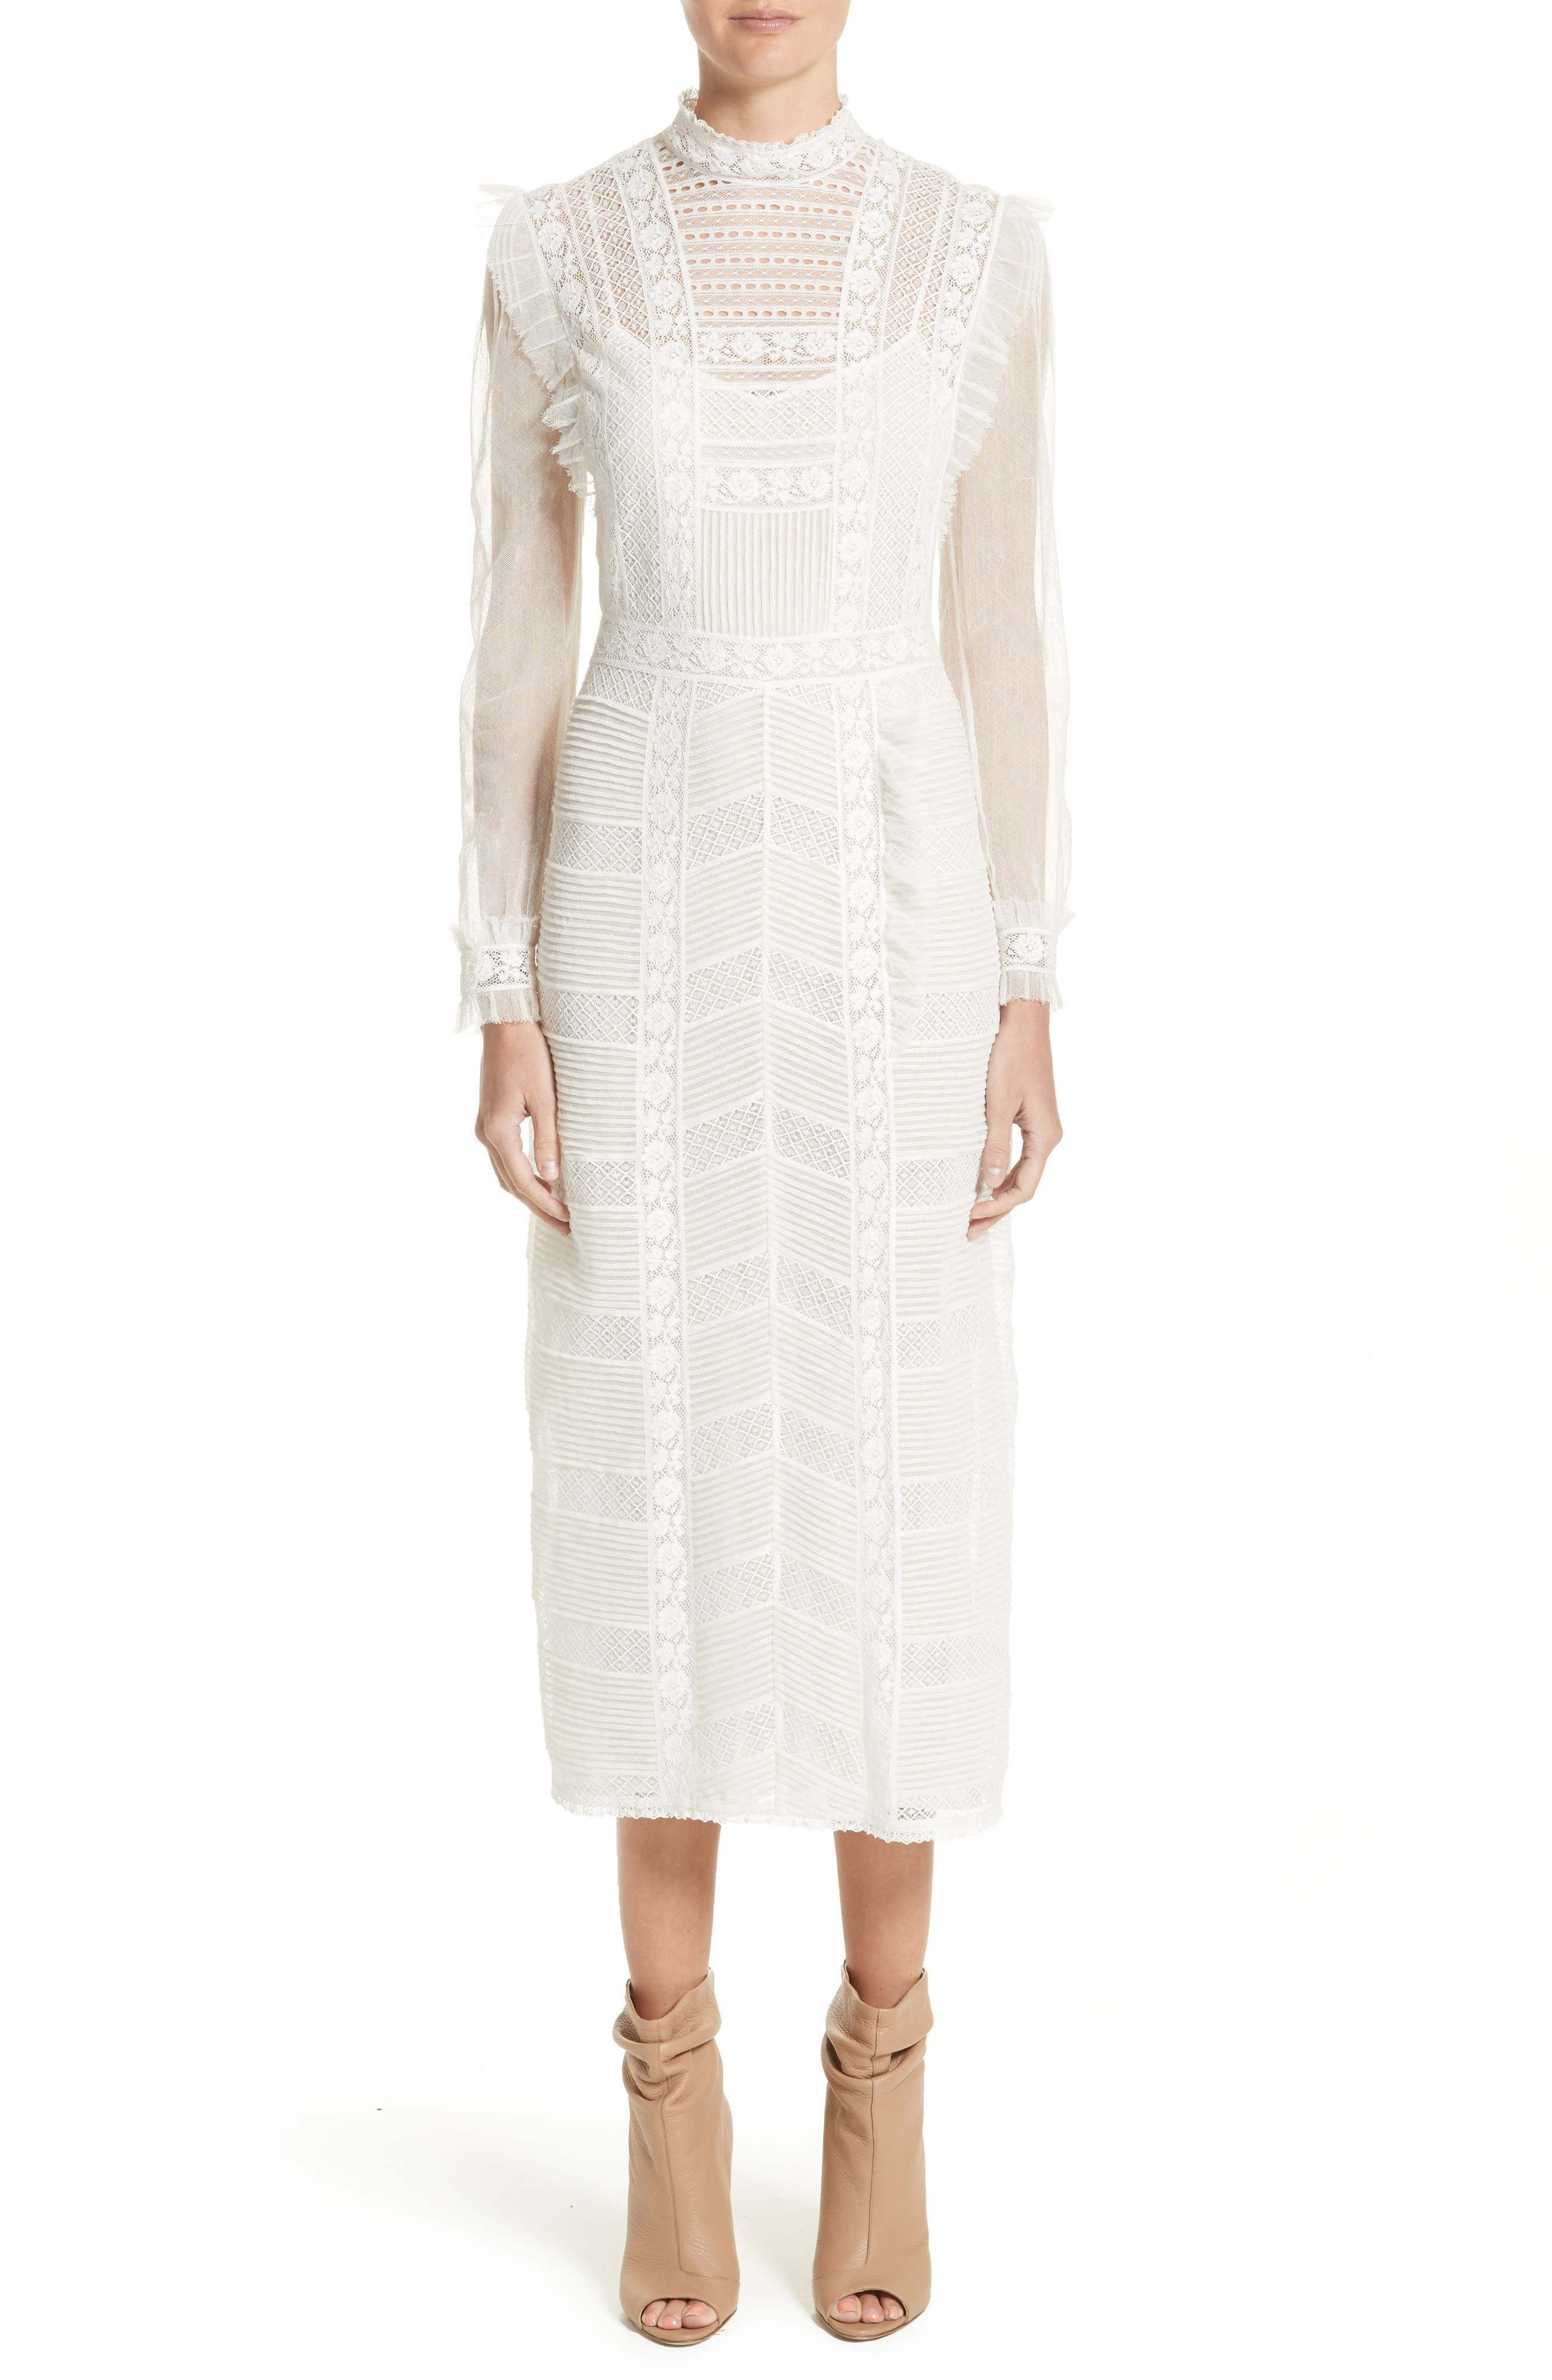 Chanella Lace Midi Dress,                             Main thumbnail 1, color,                             100